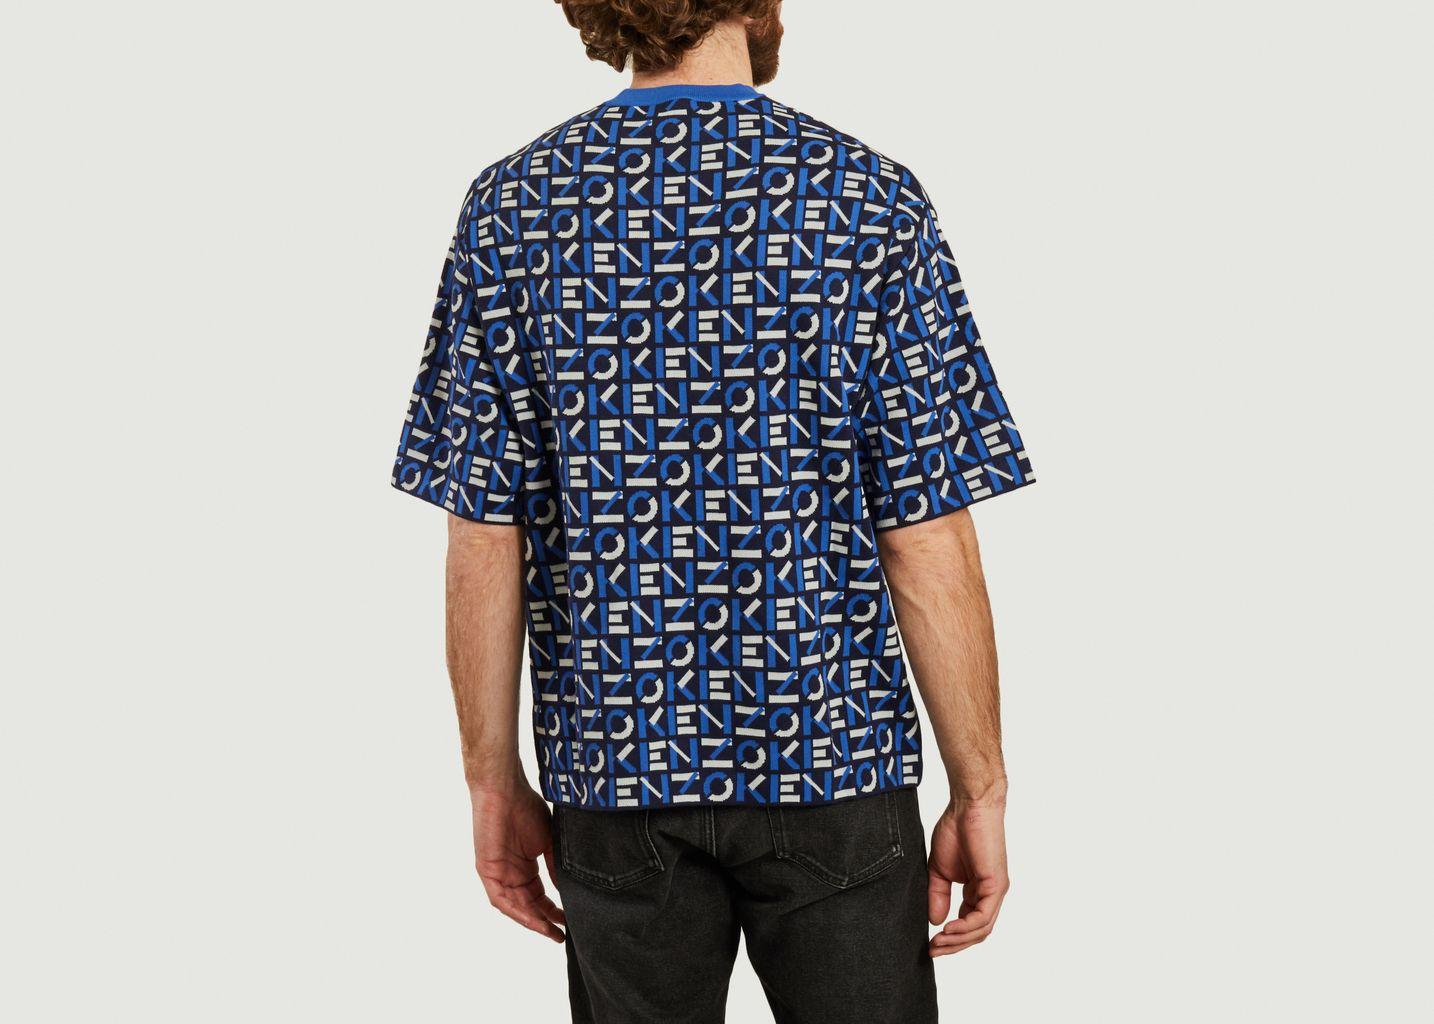 T-shirt Monogram - Kenzo